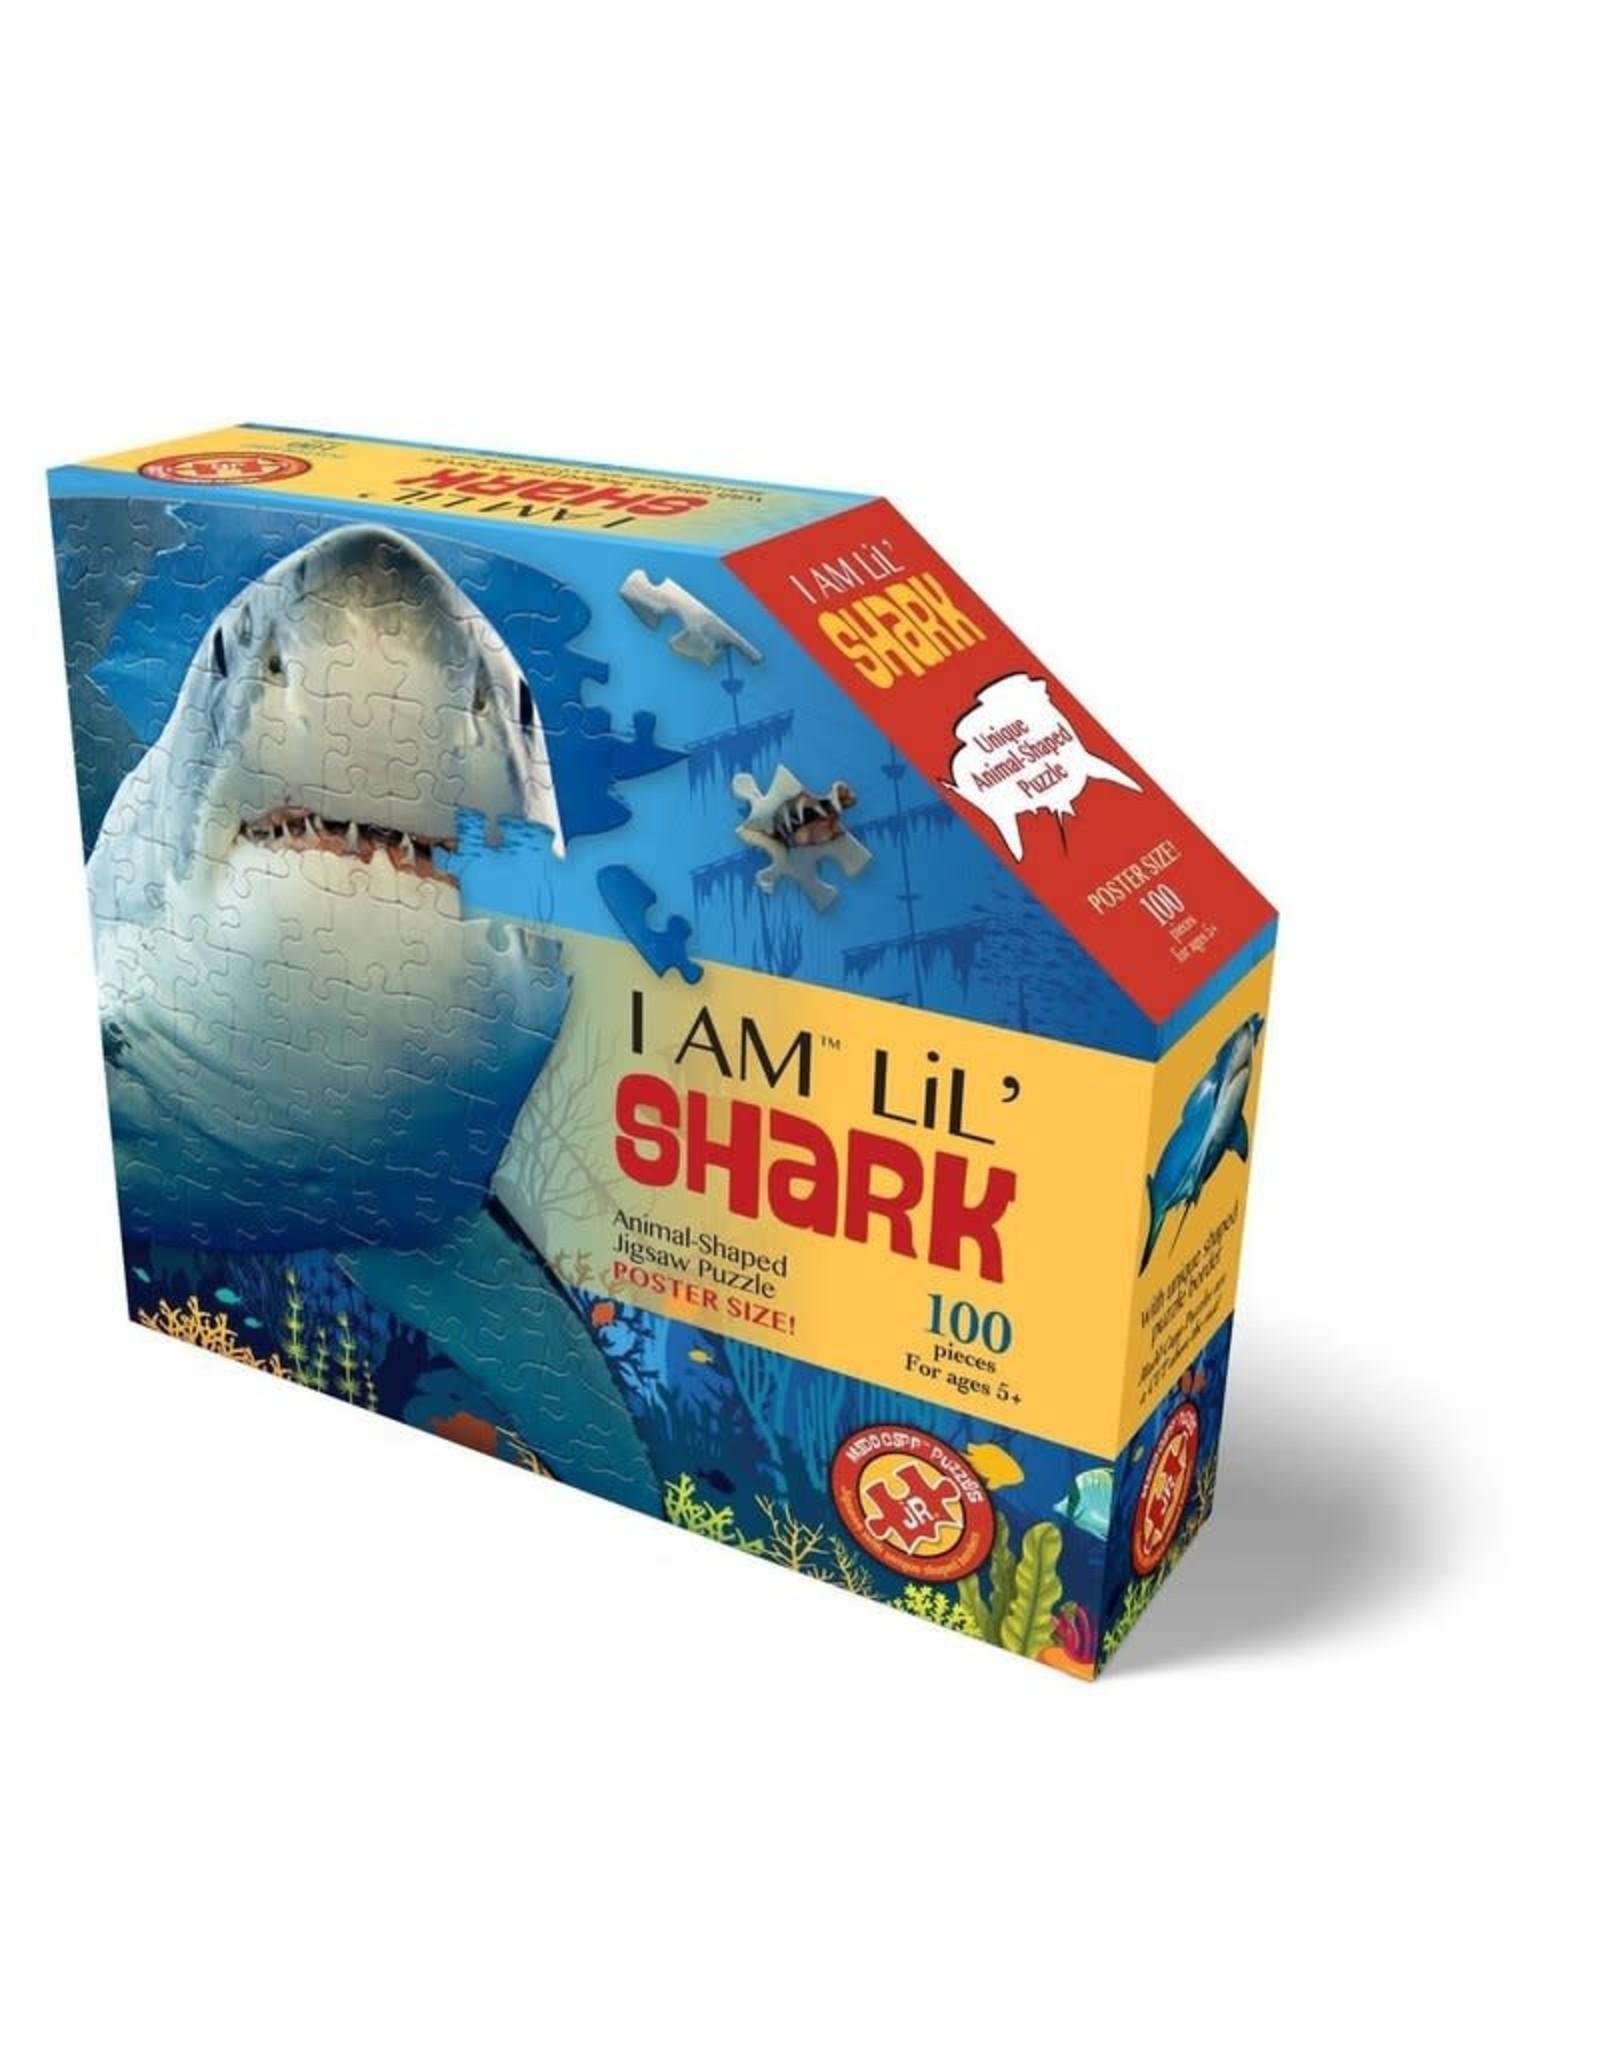 Madd Capp I Am A Lil' Shark 100 Piece Puzzle